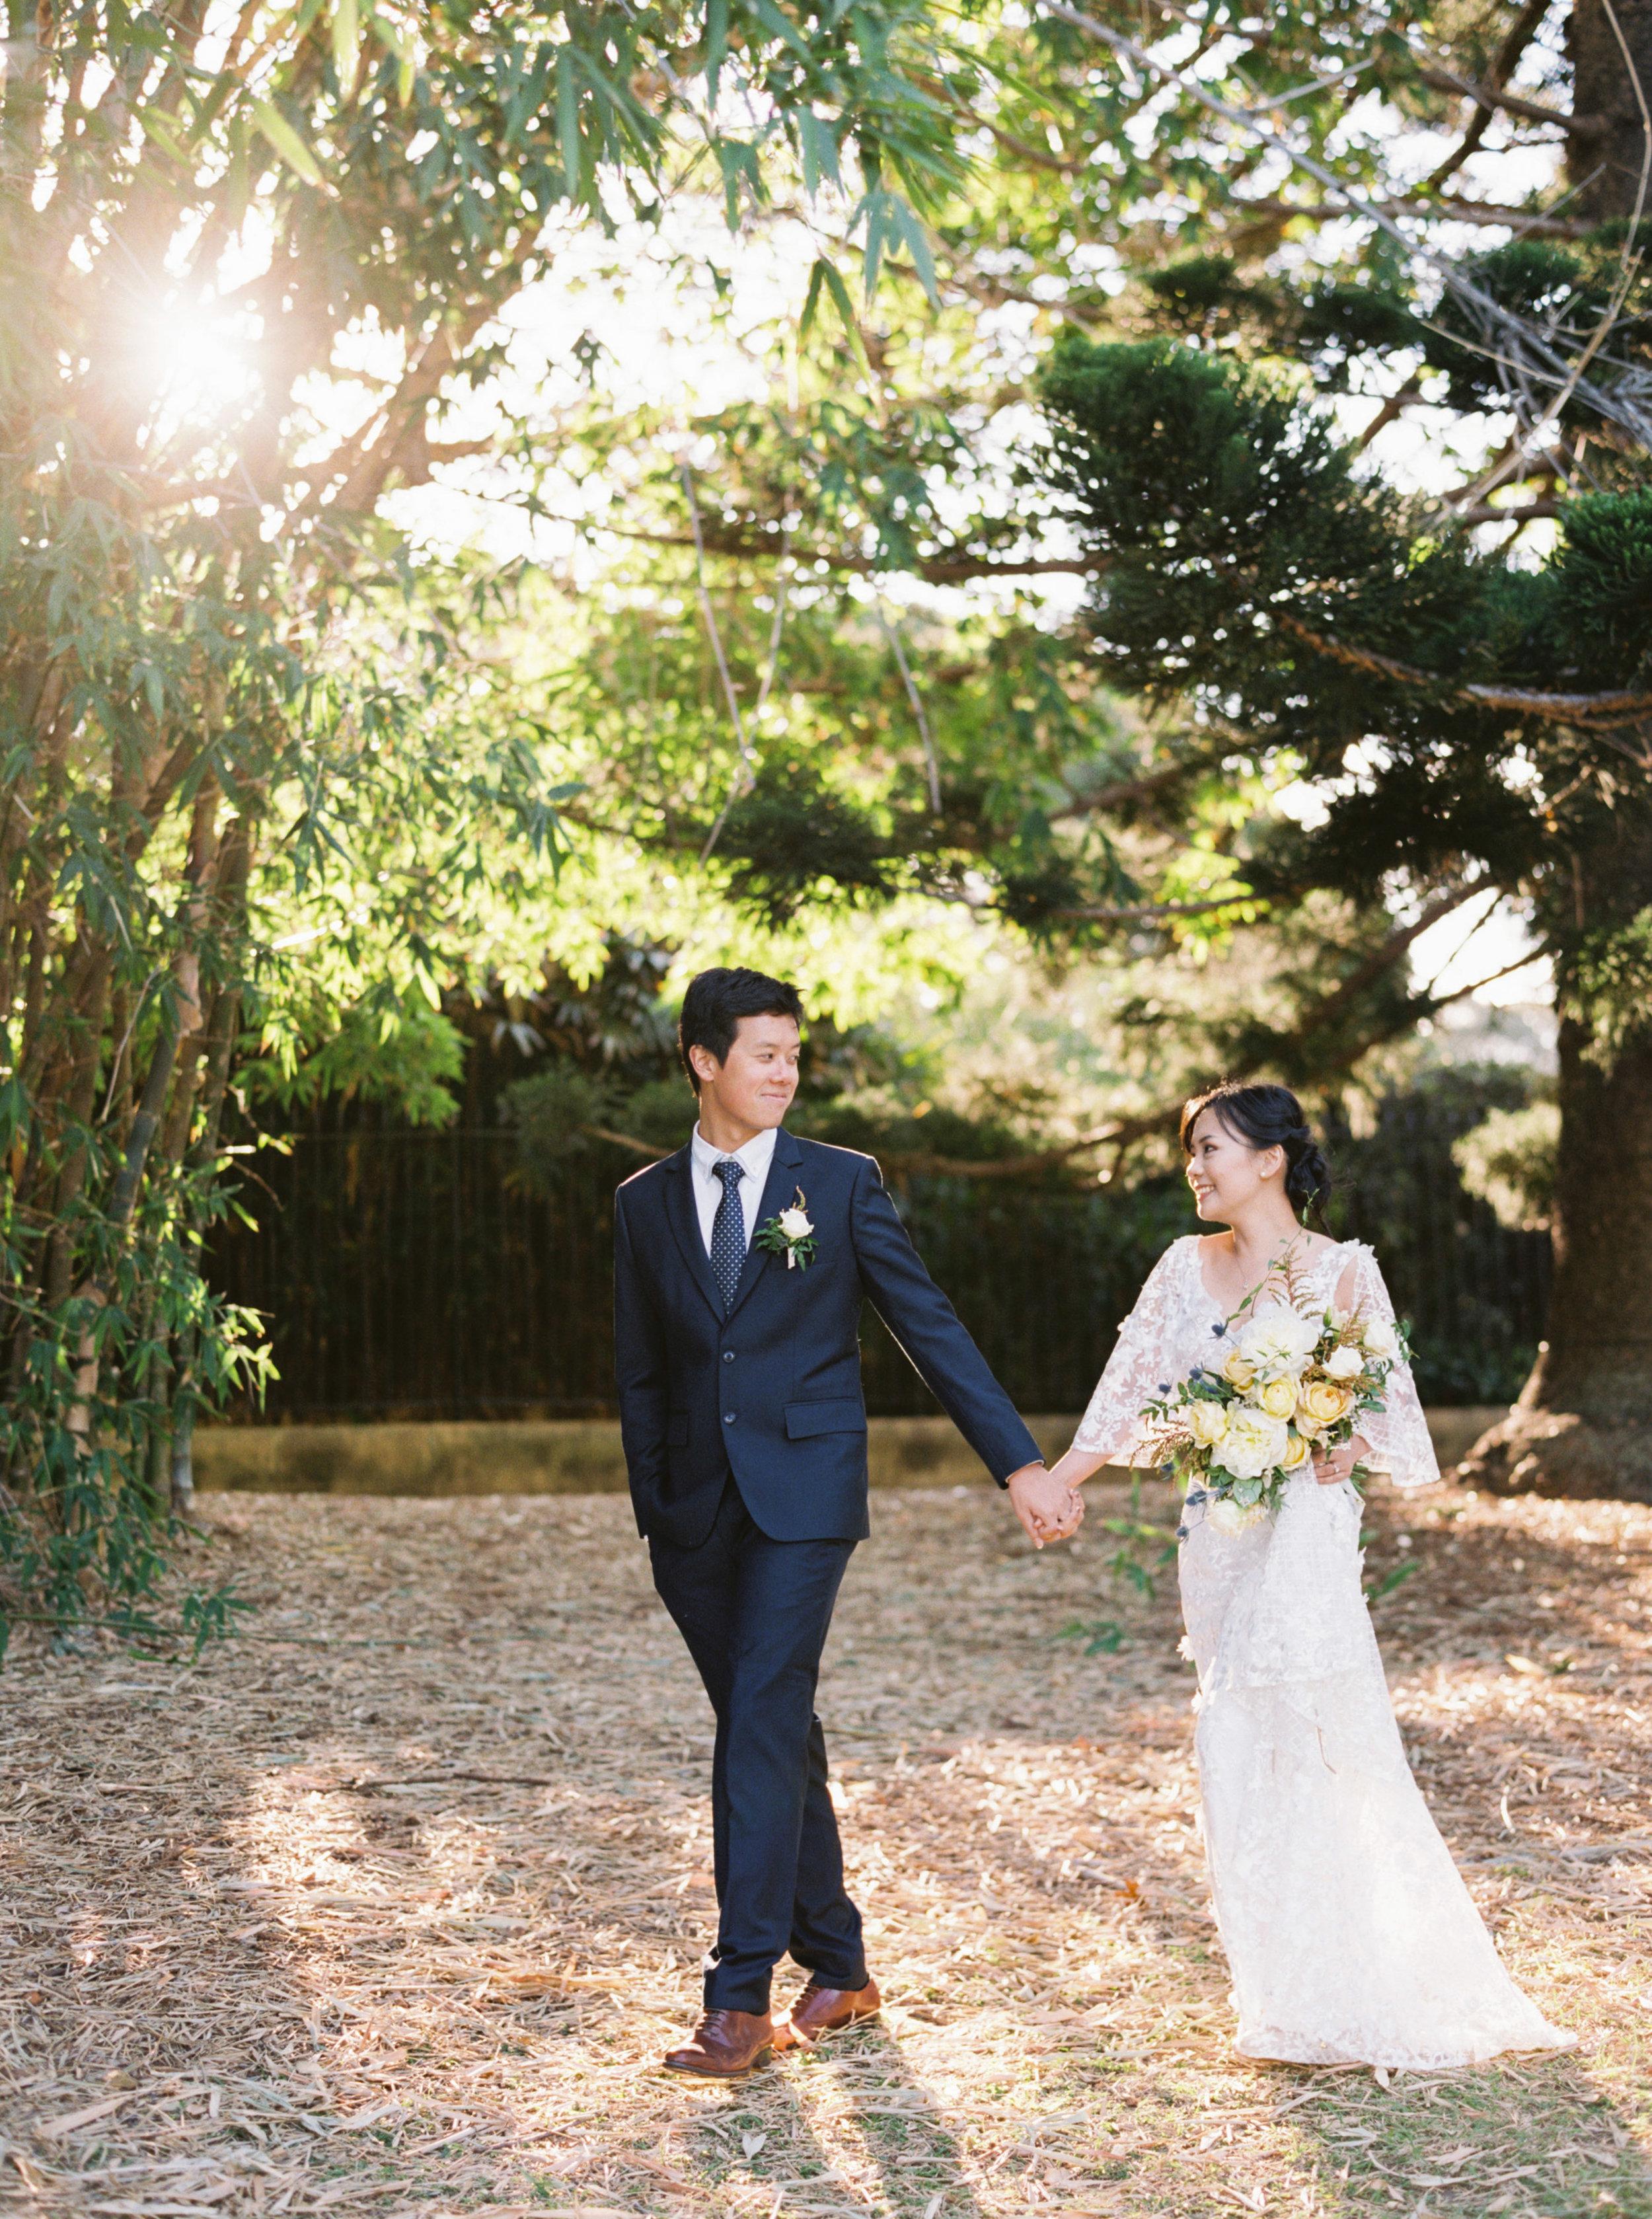 00024- Australia Sydney Wedding Photographer Sheri McMahon.jpg